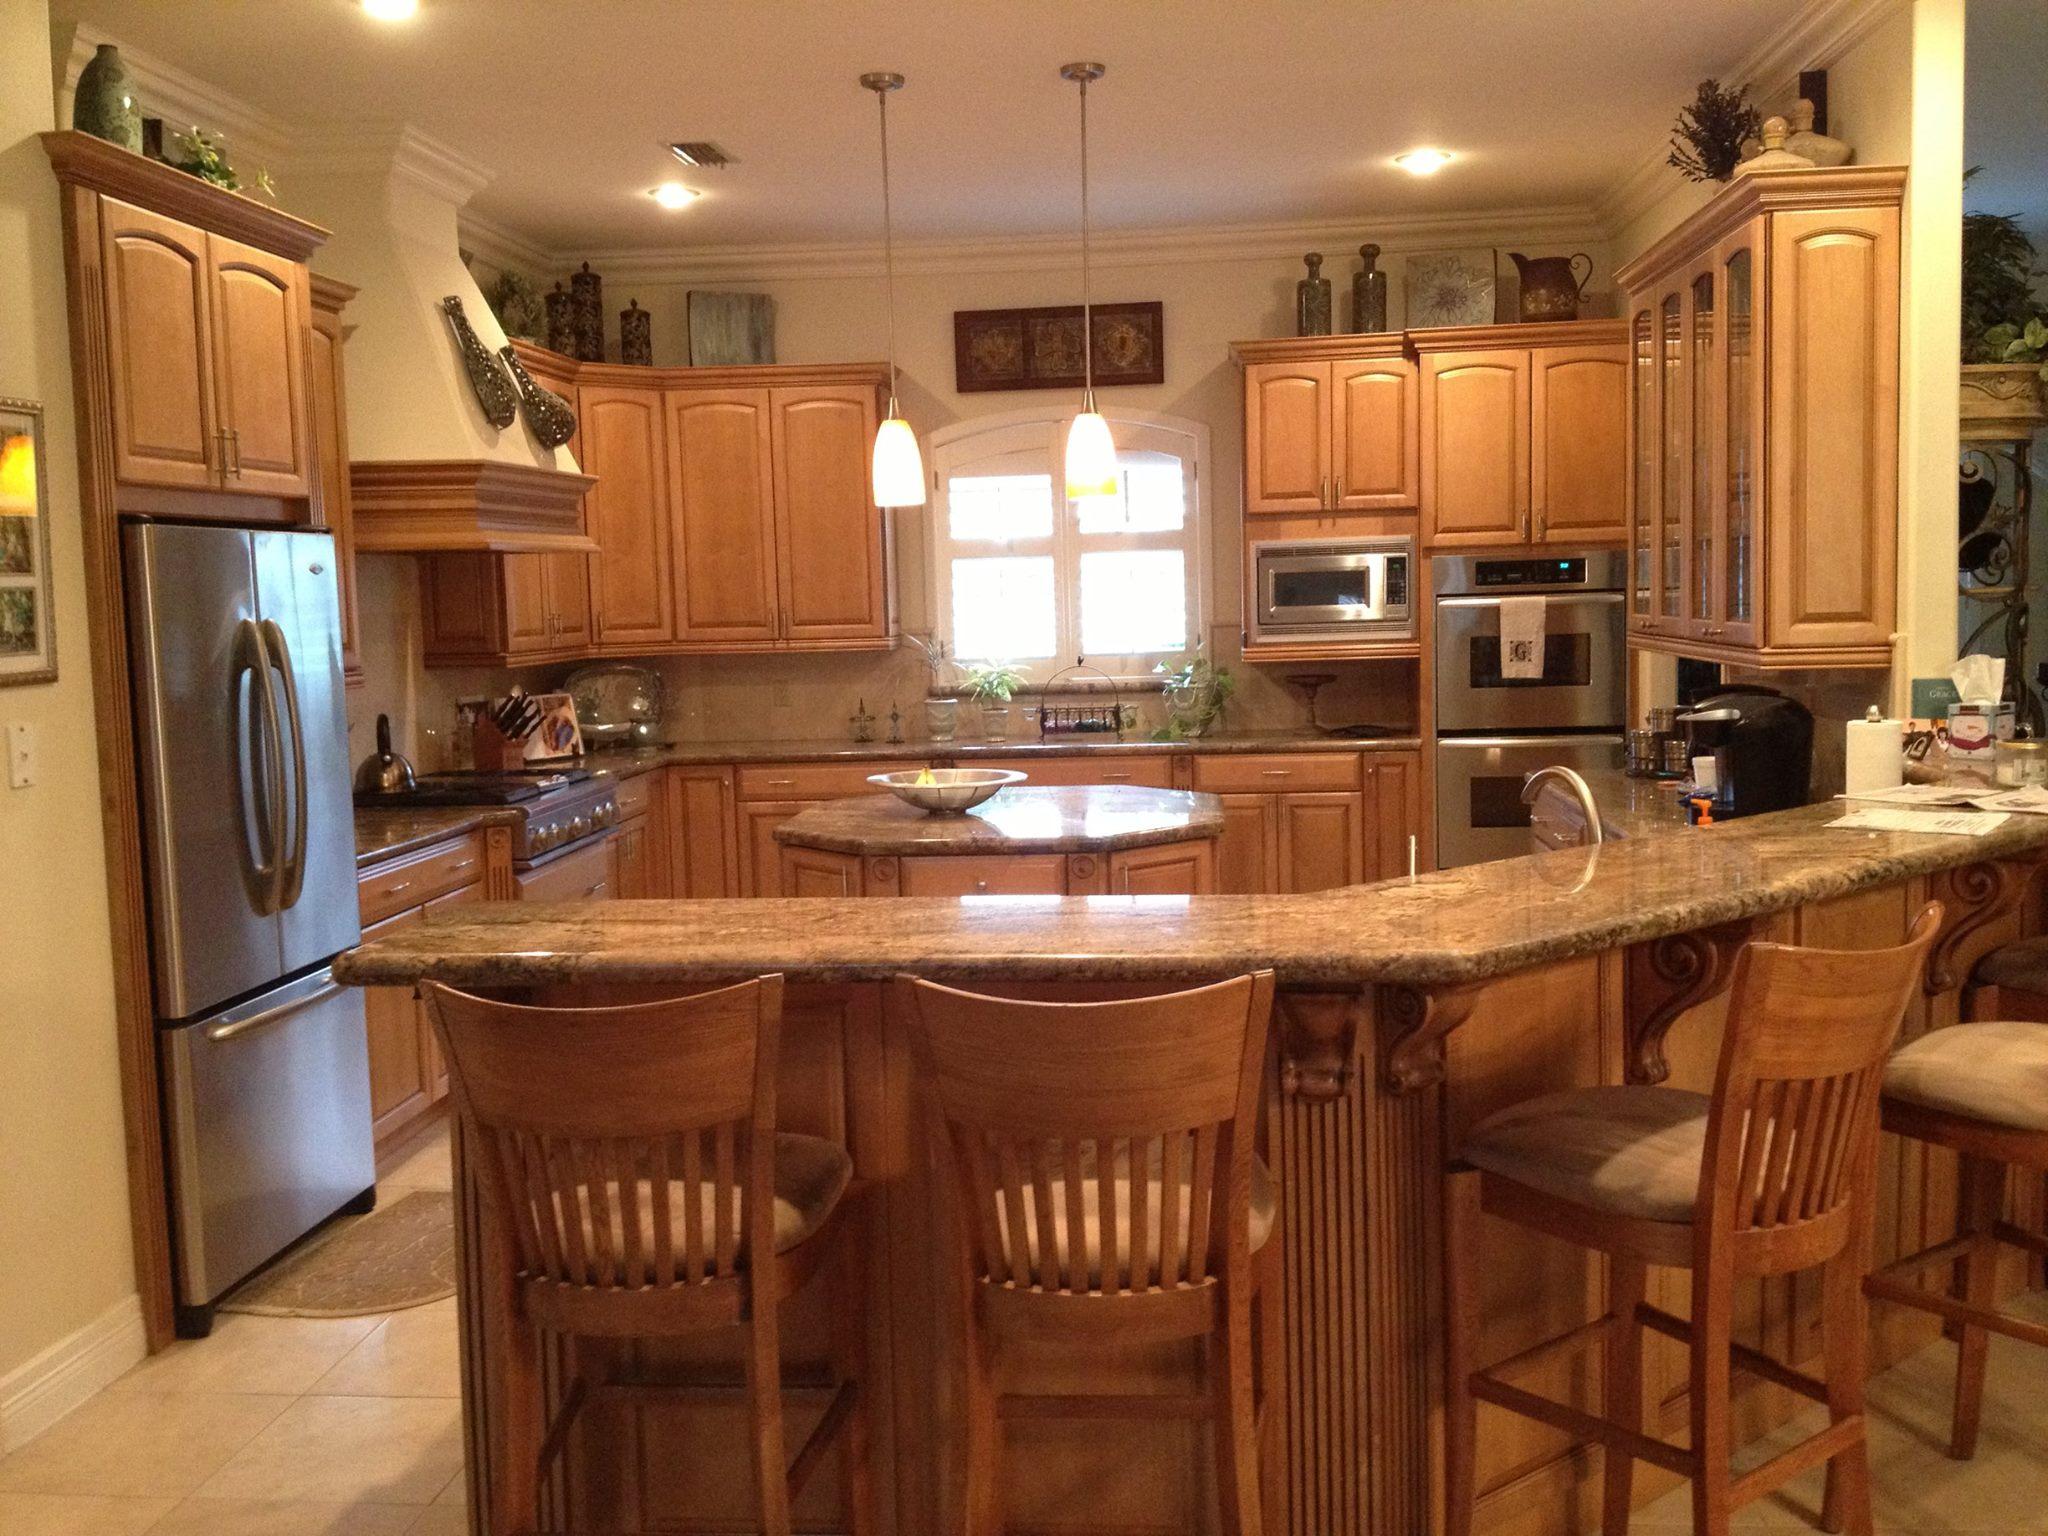 Romans cabinets - Kraftmaid kitchen cabinets ...